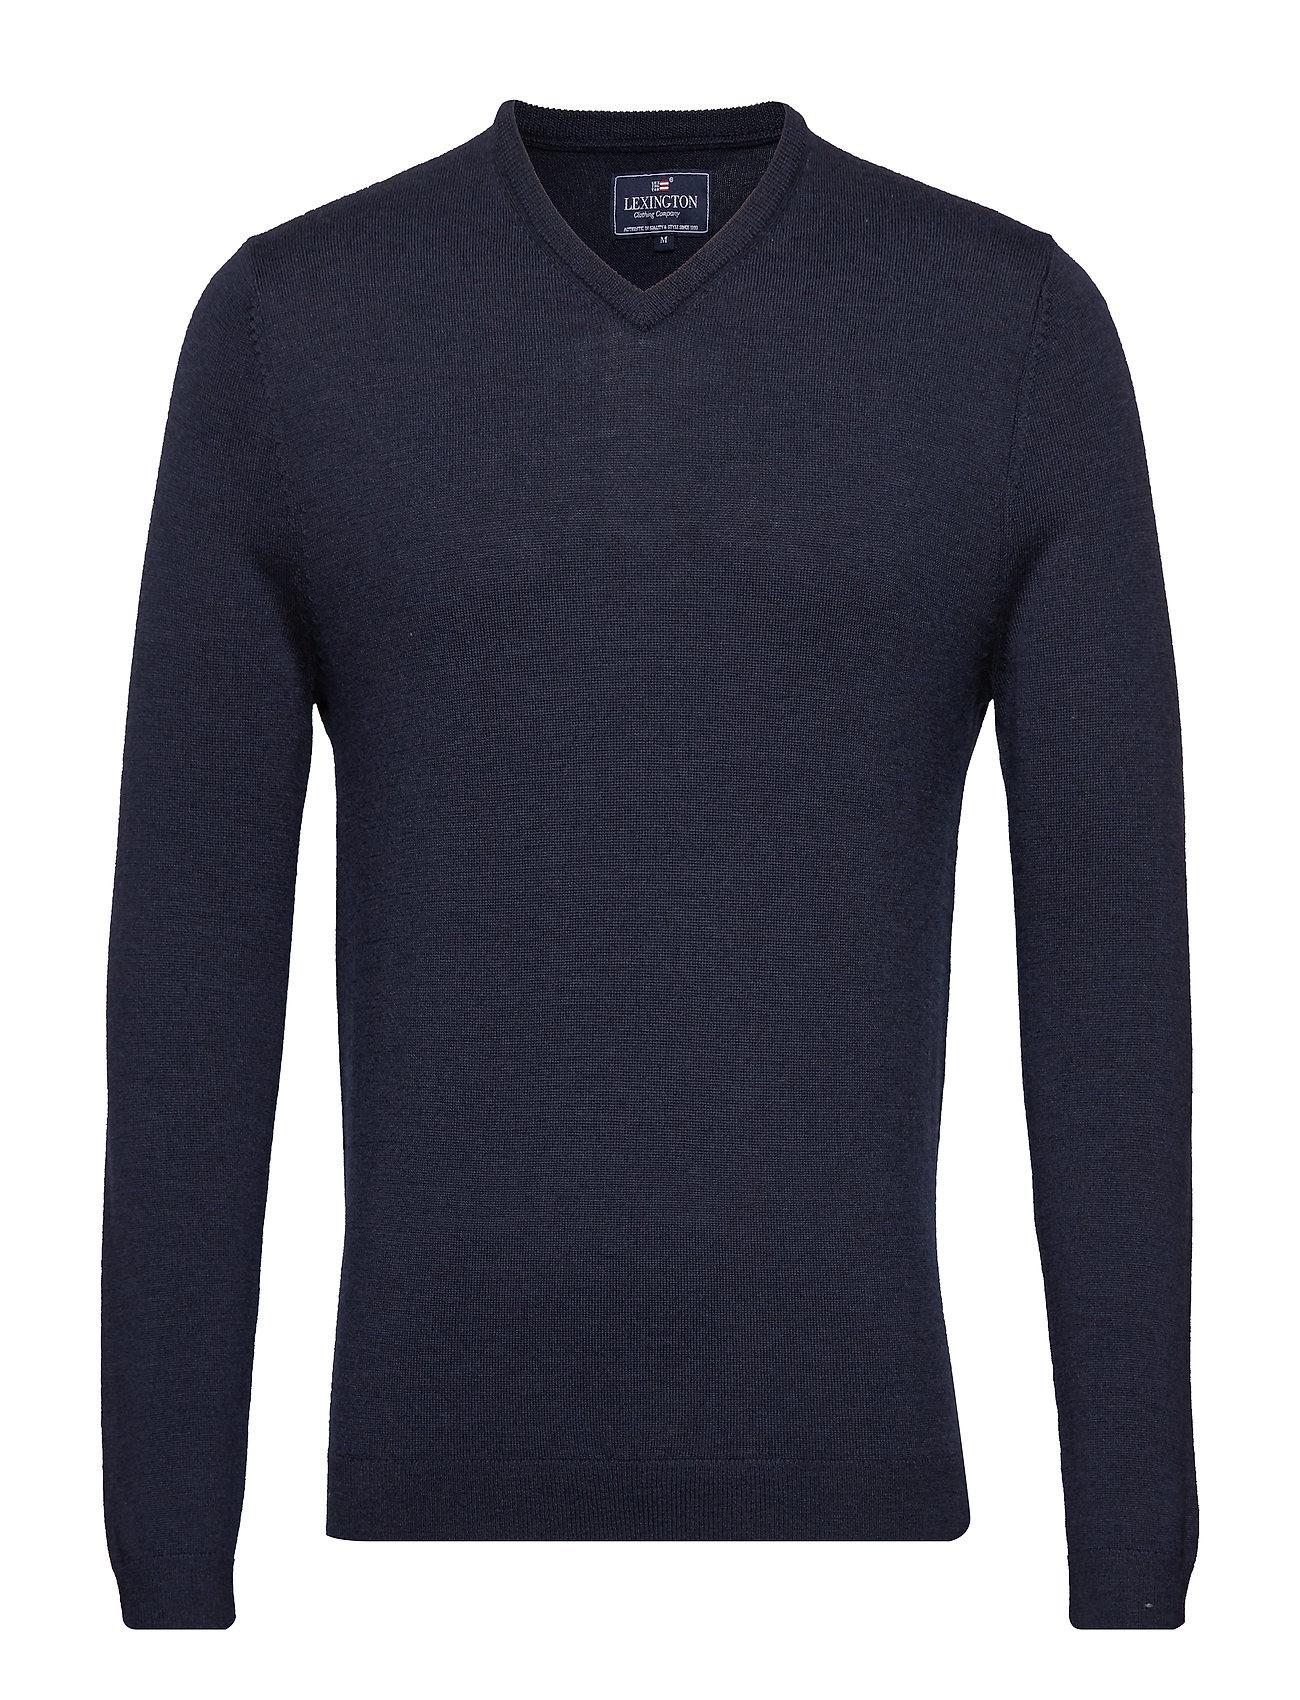 V neck BlueLexington Sweaterdeep Marine Ian Clothing Merino BtdCshQrox